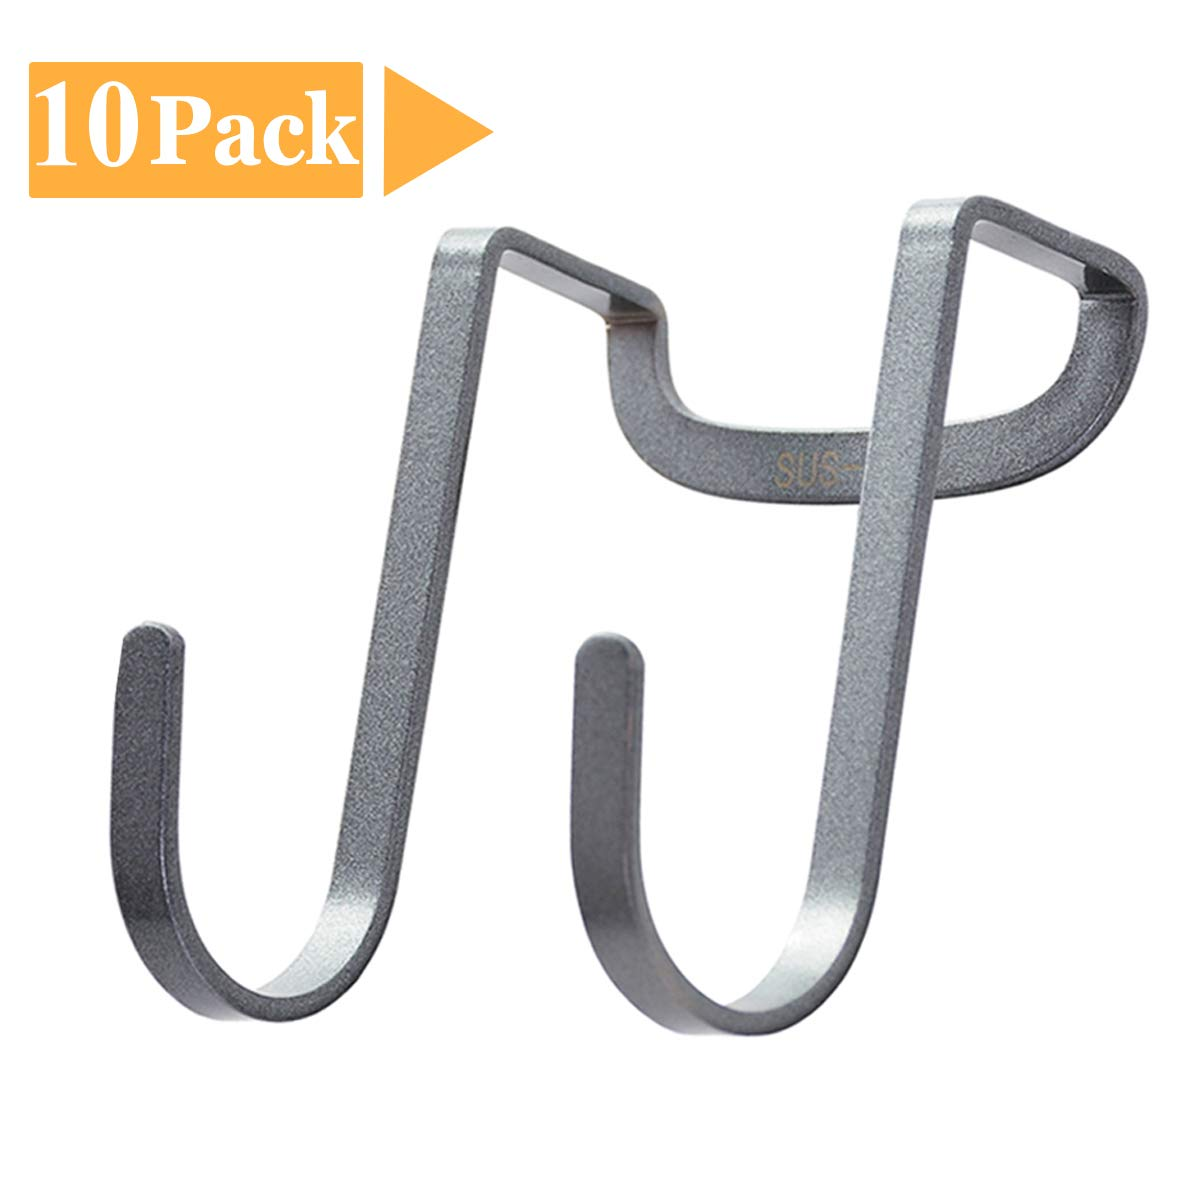 FLE Double S Hooks Over Cabinet Door Hook Stainless Steel Multipurpose S Hook Over The Door Hook Use for Kitchen, Cabinet, Drawer, Bathroom, Wardrobe, Office, 10-Pack